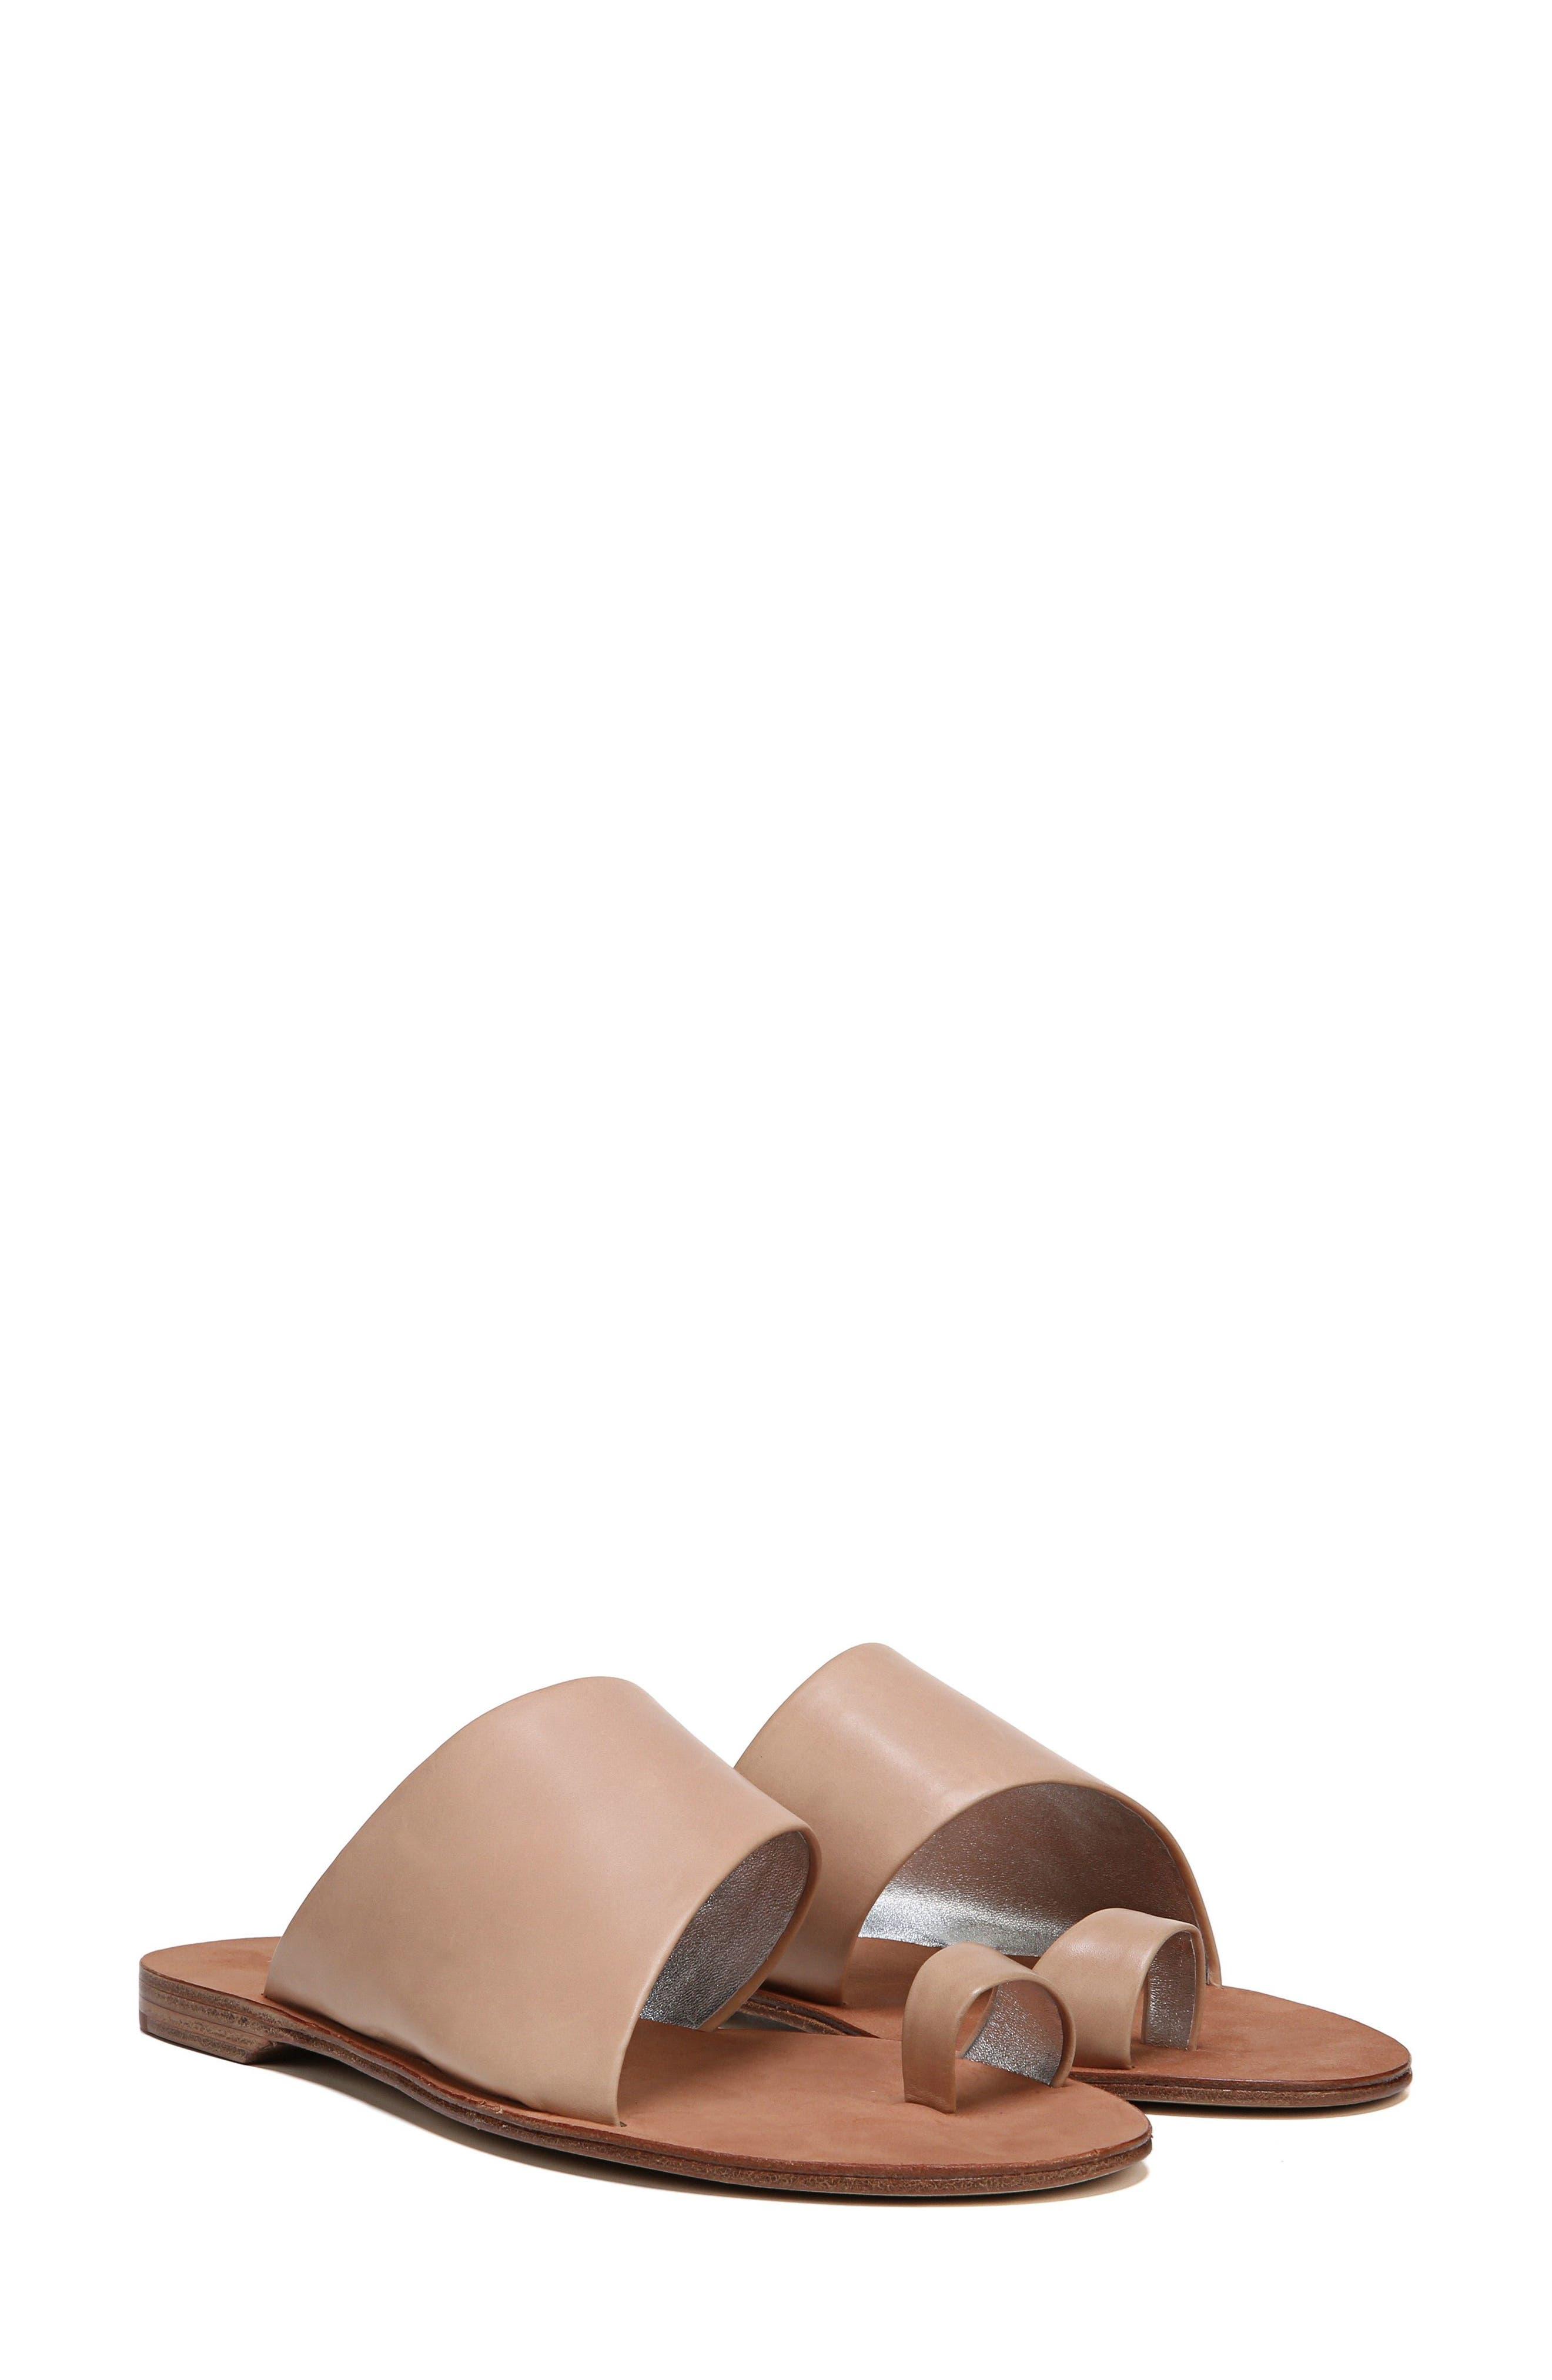 Brittany Asymmetrical Flat Sandal,                             Alternate thumbnail 7, color,                             202